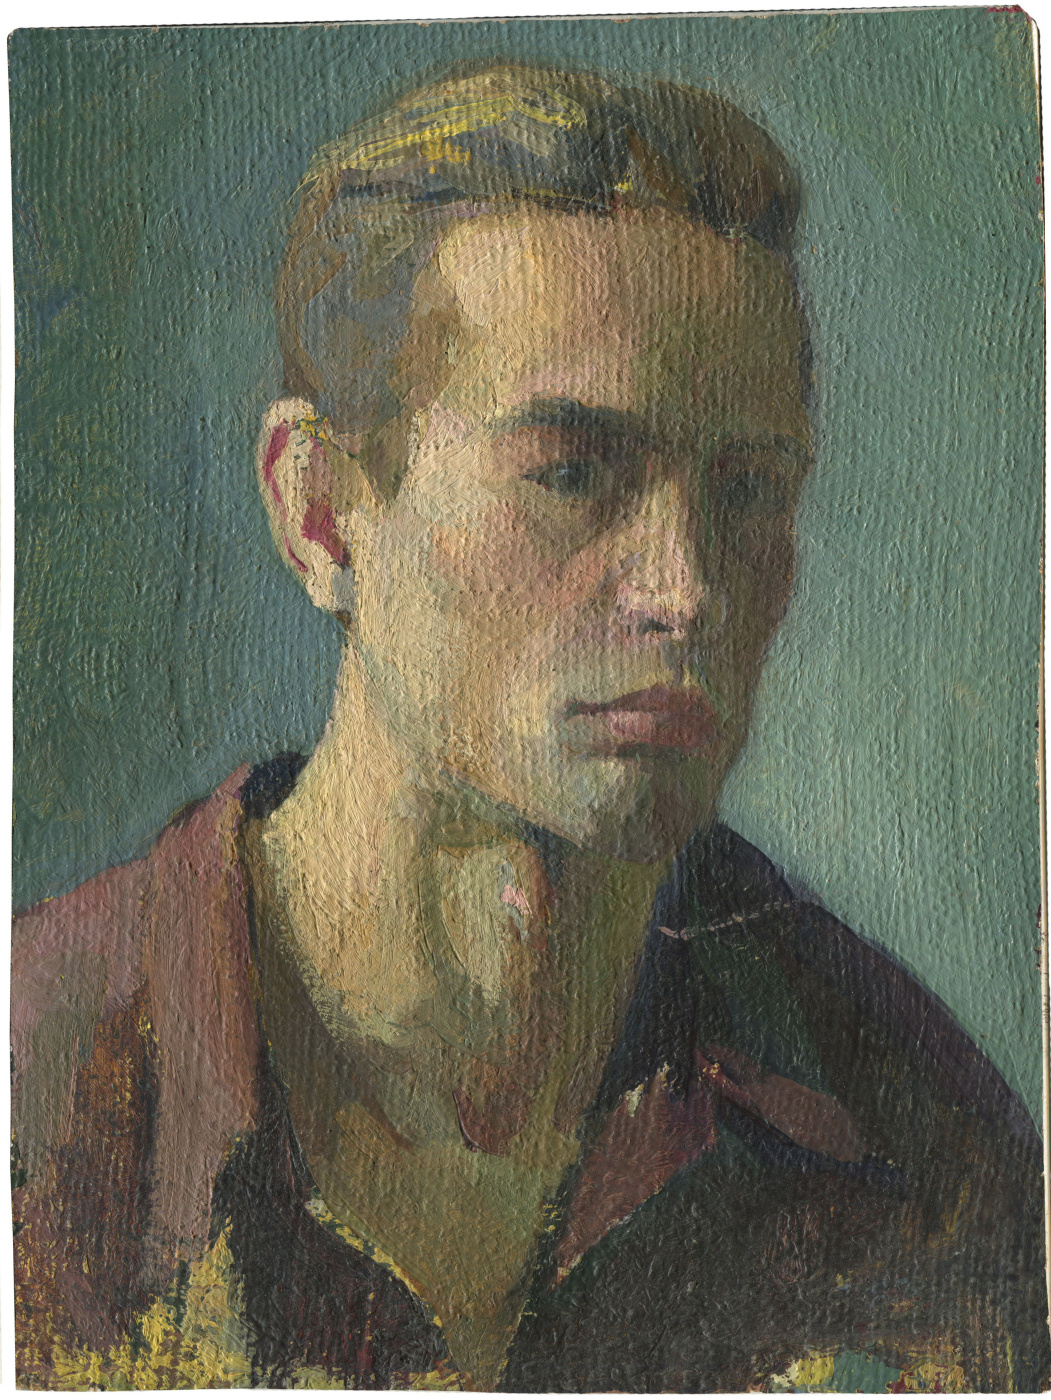 Alexandrovich Rudolf Pavlov. Self portrait 2. 1964